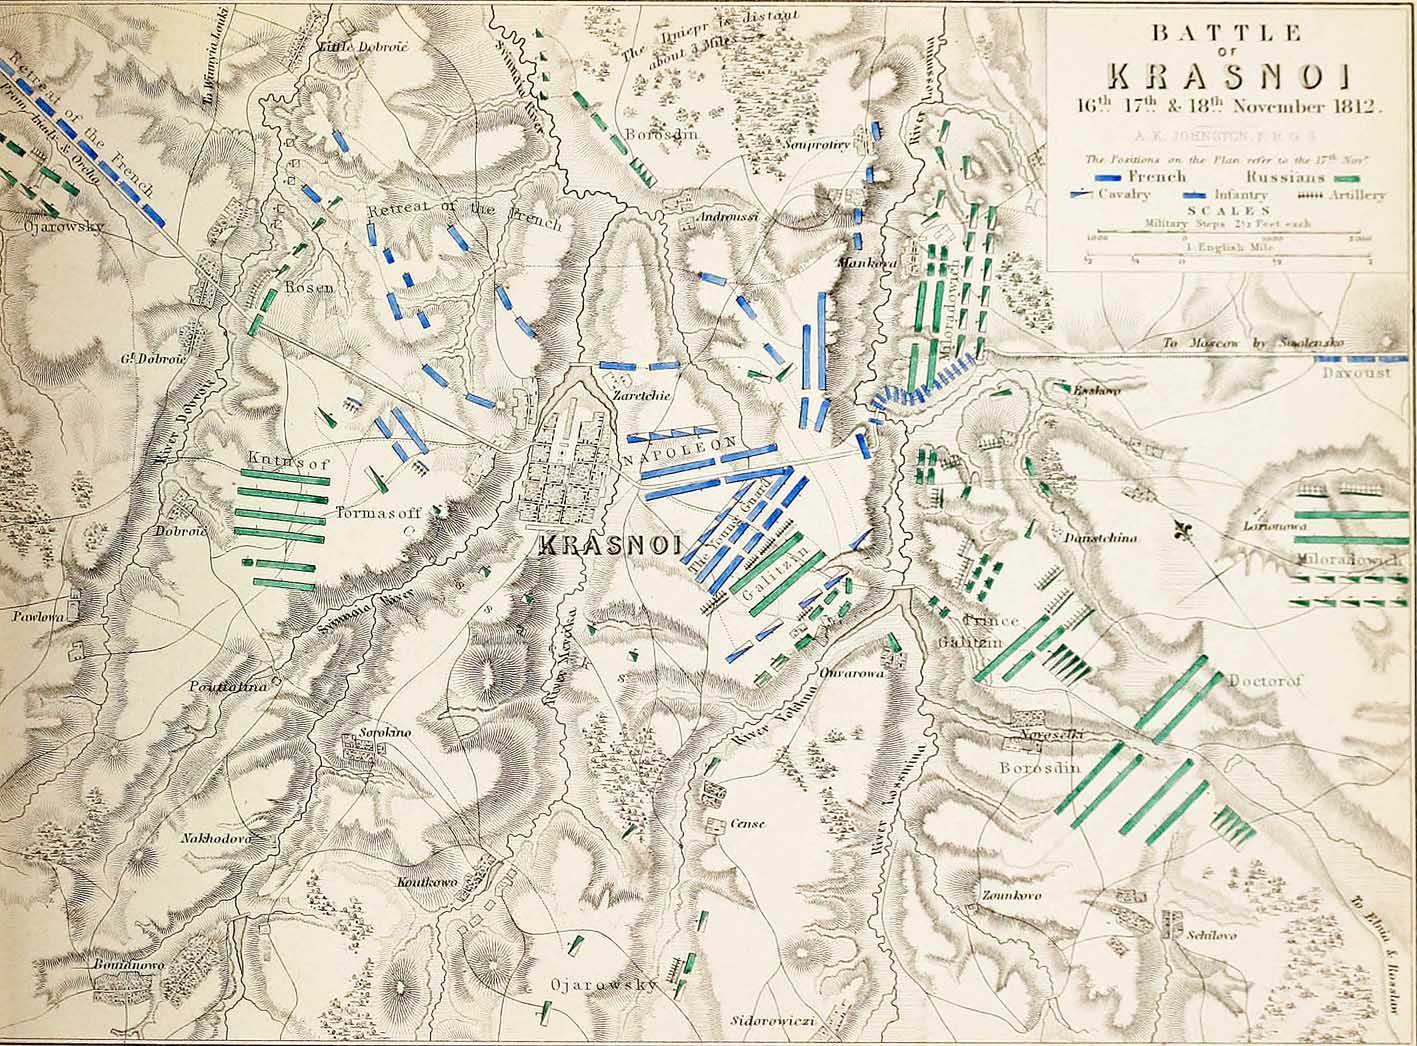 campagne de russie 1812